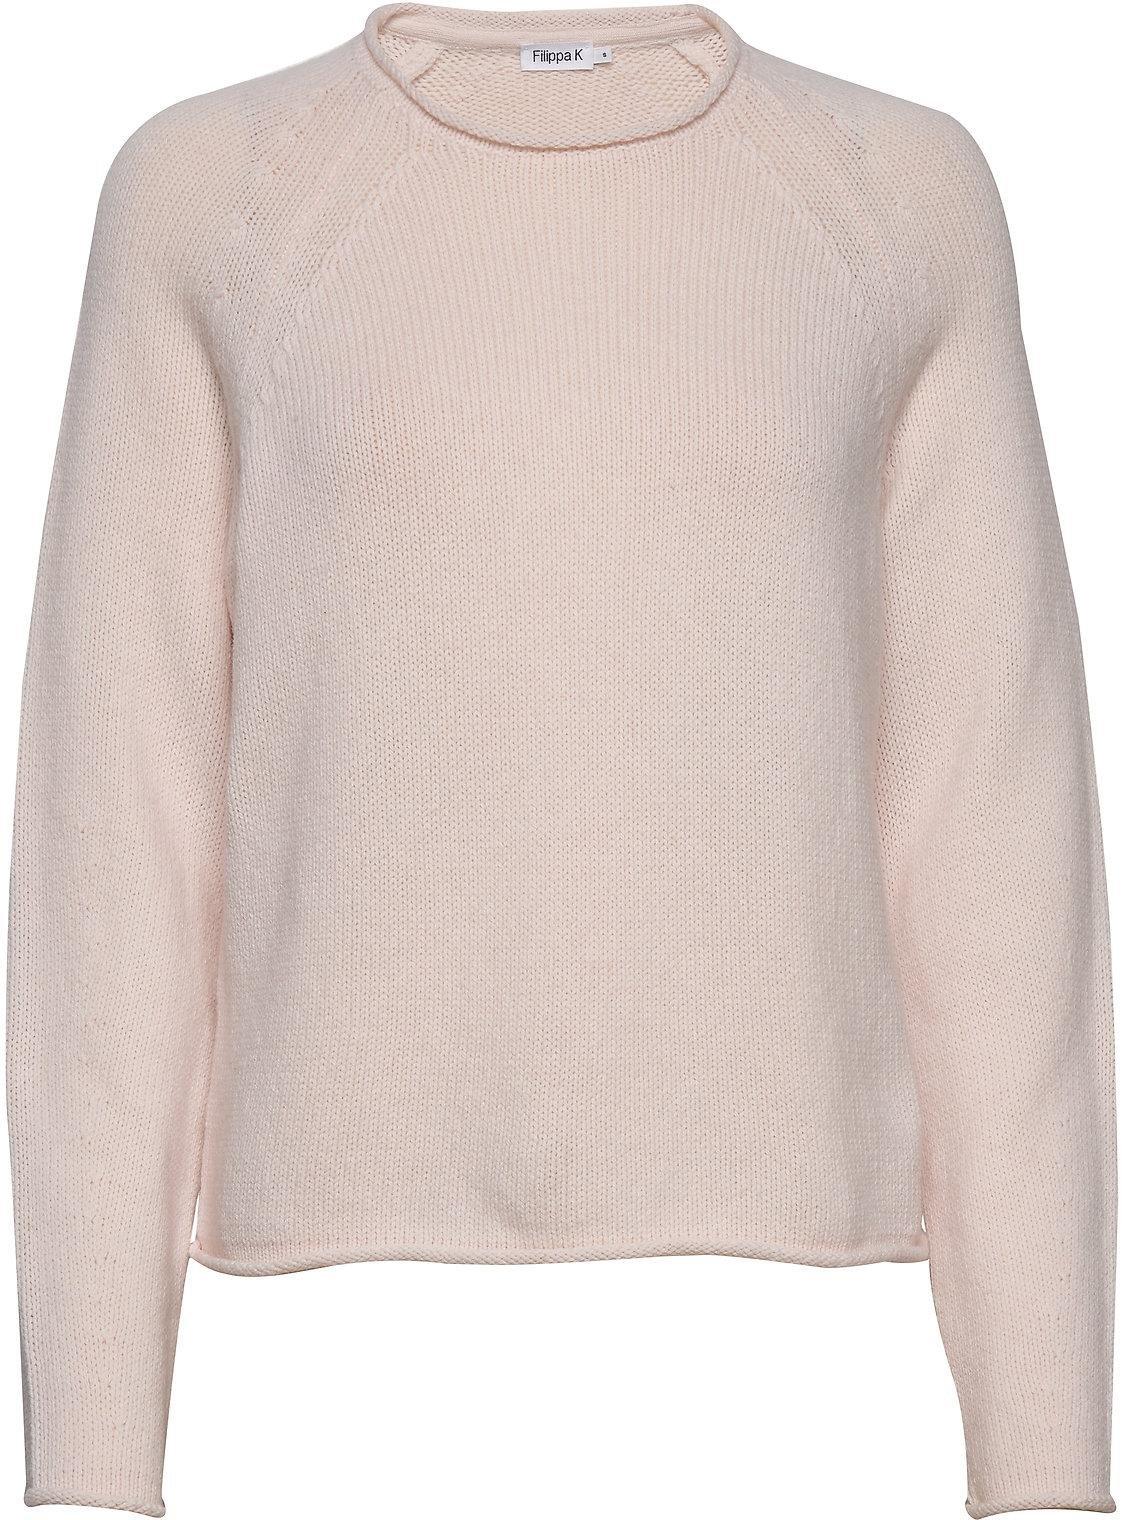 Pink Sweater Dahlia   Filippa K   Strikkejakker & gensere